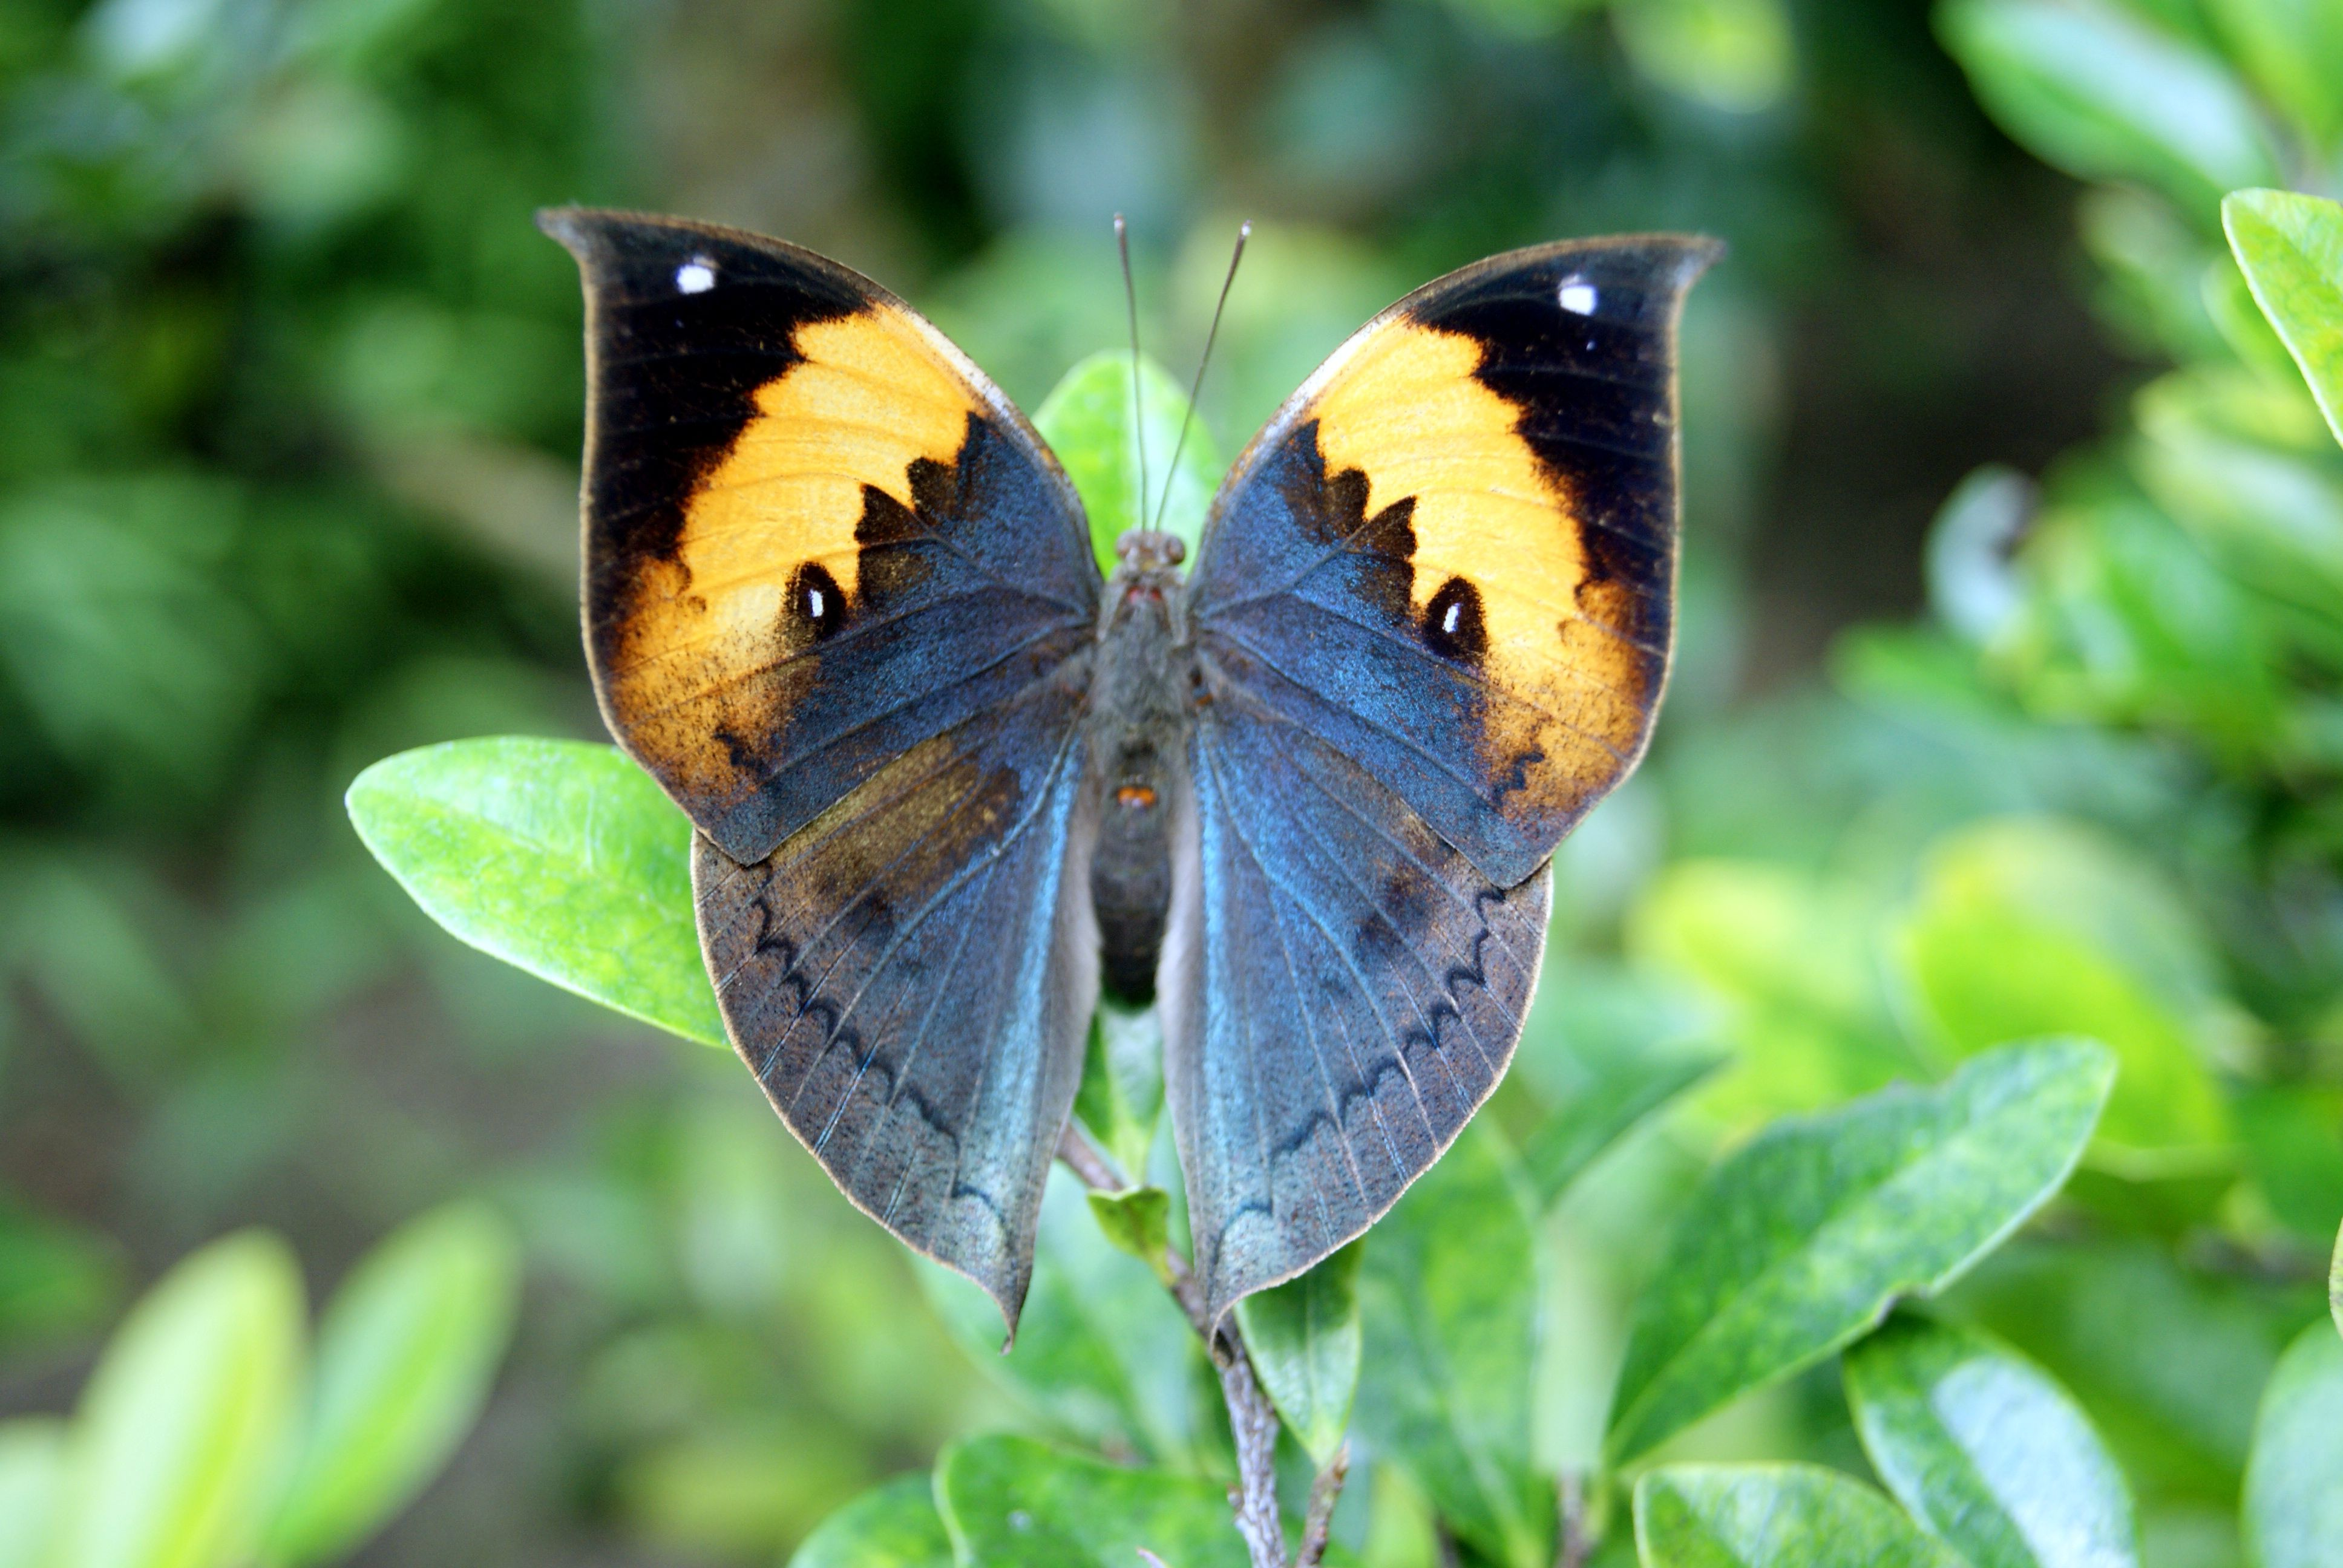 Real World Fatos: As borboletas mais incríveis do mundo